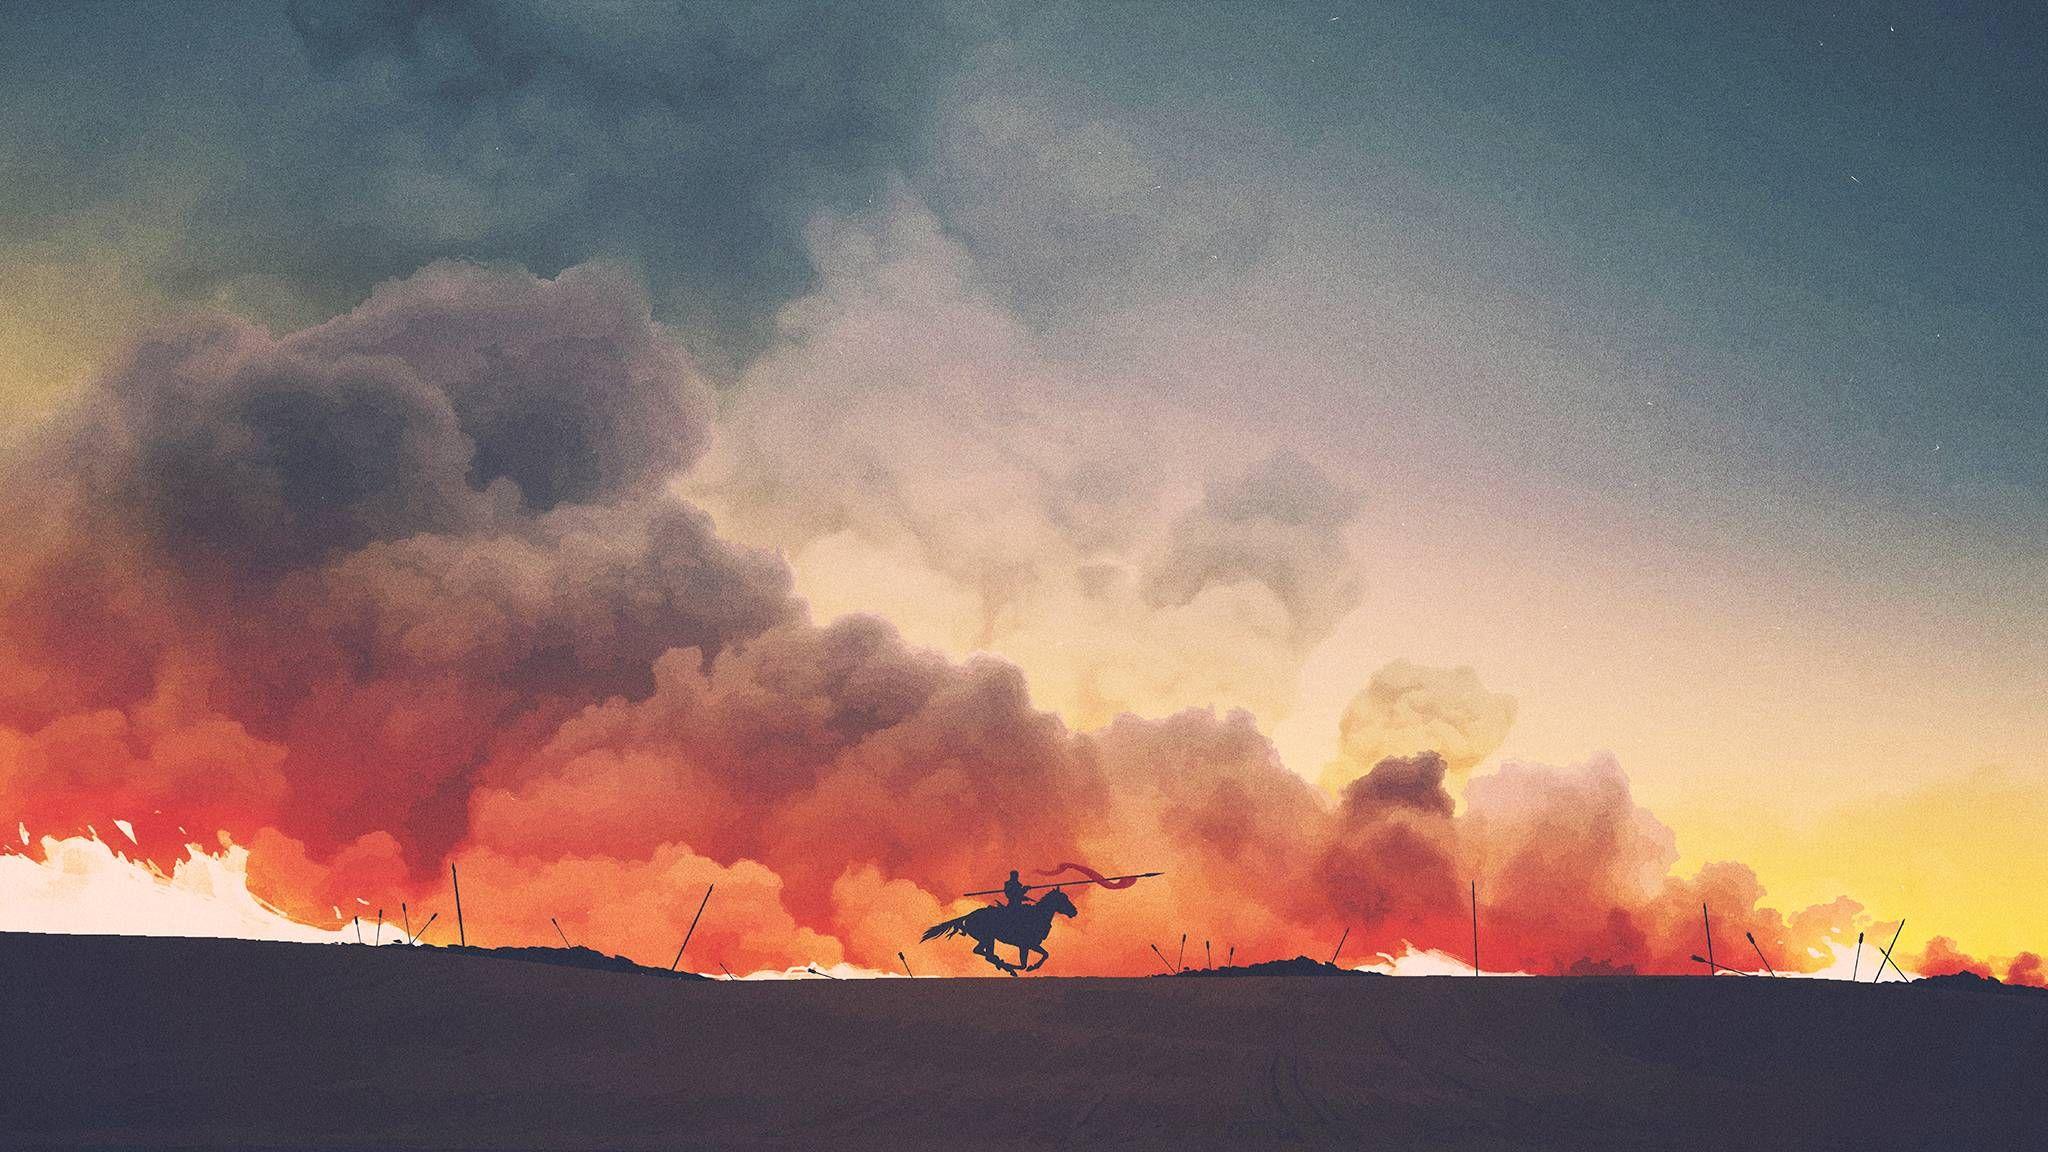 Jaime Lannister Aesthetic Wallpapers Game Of Thrones Art Horse Illustration